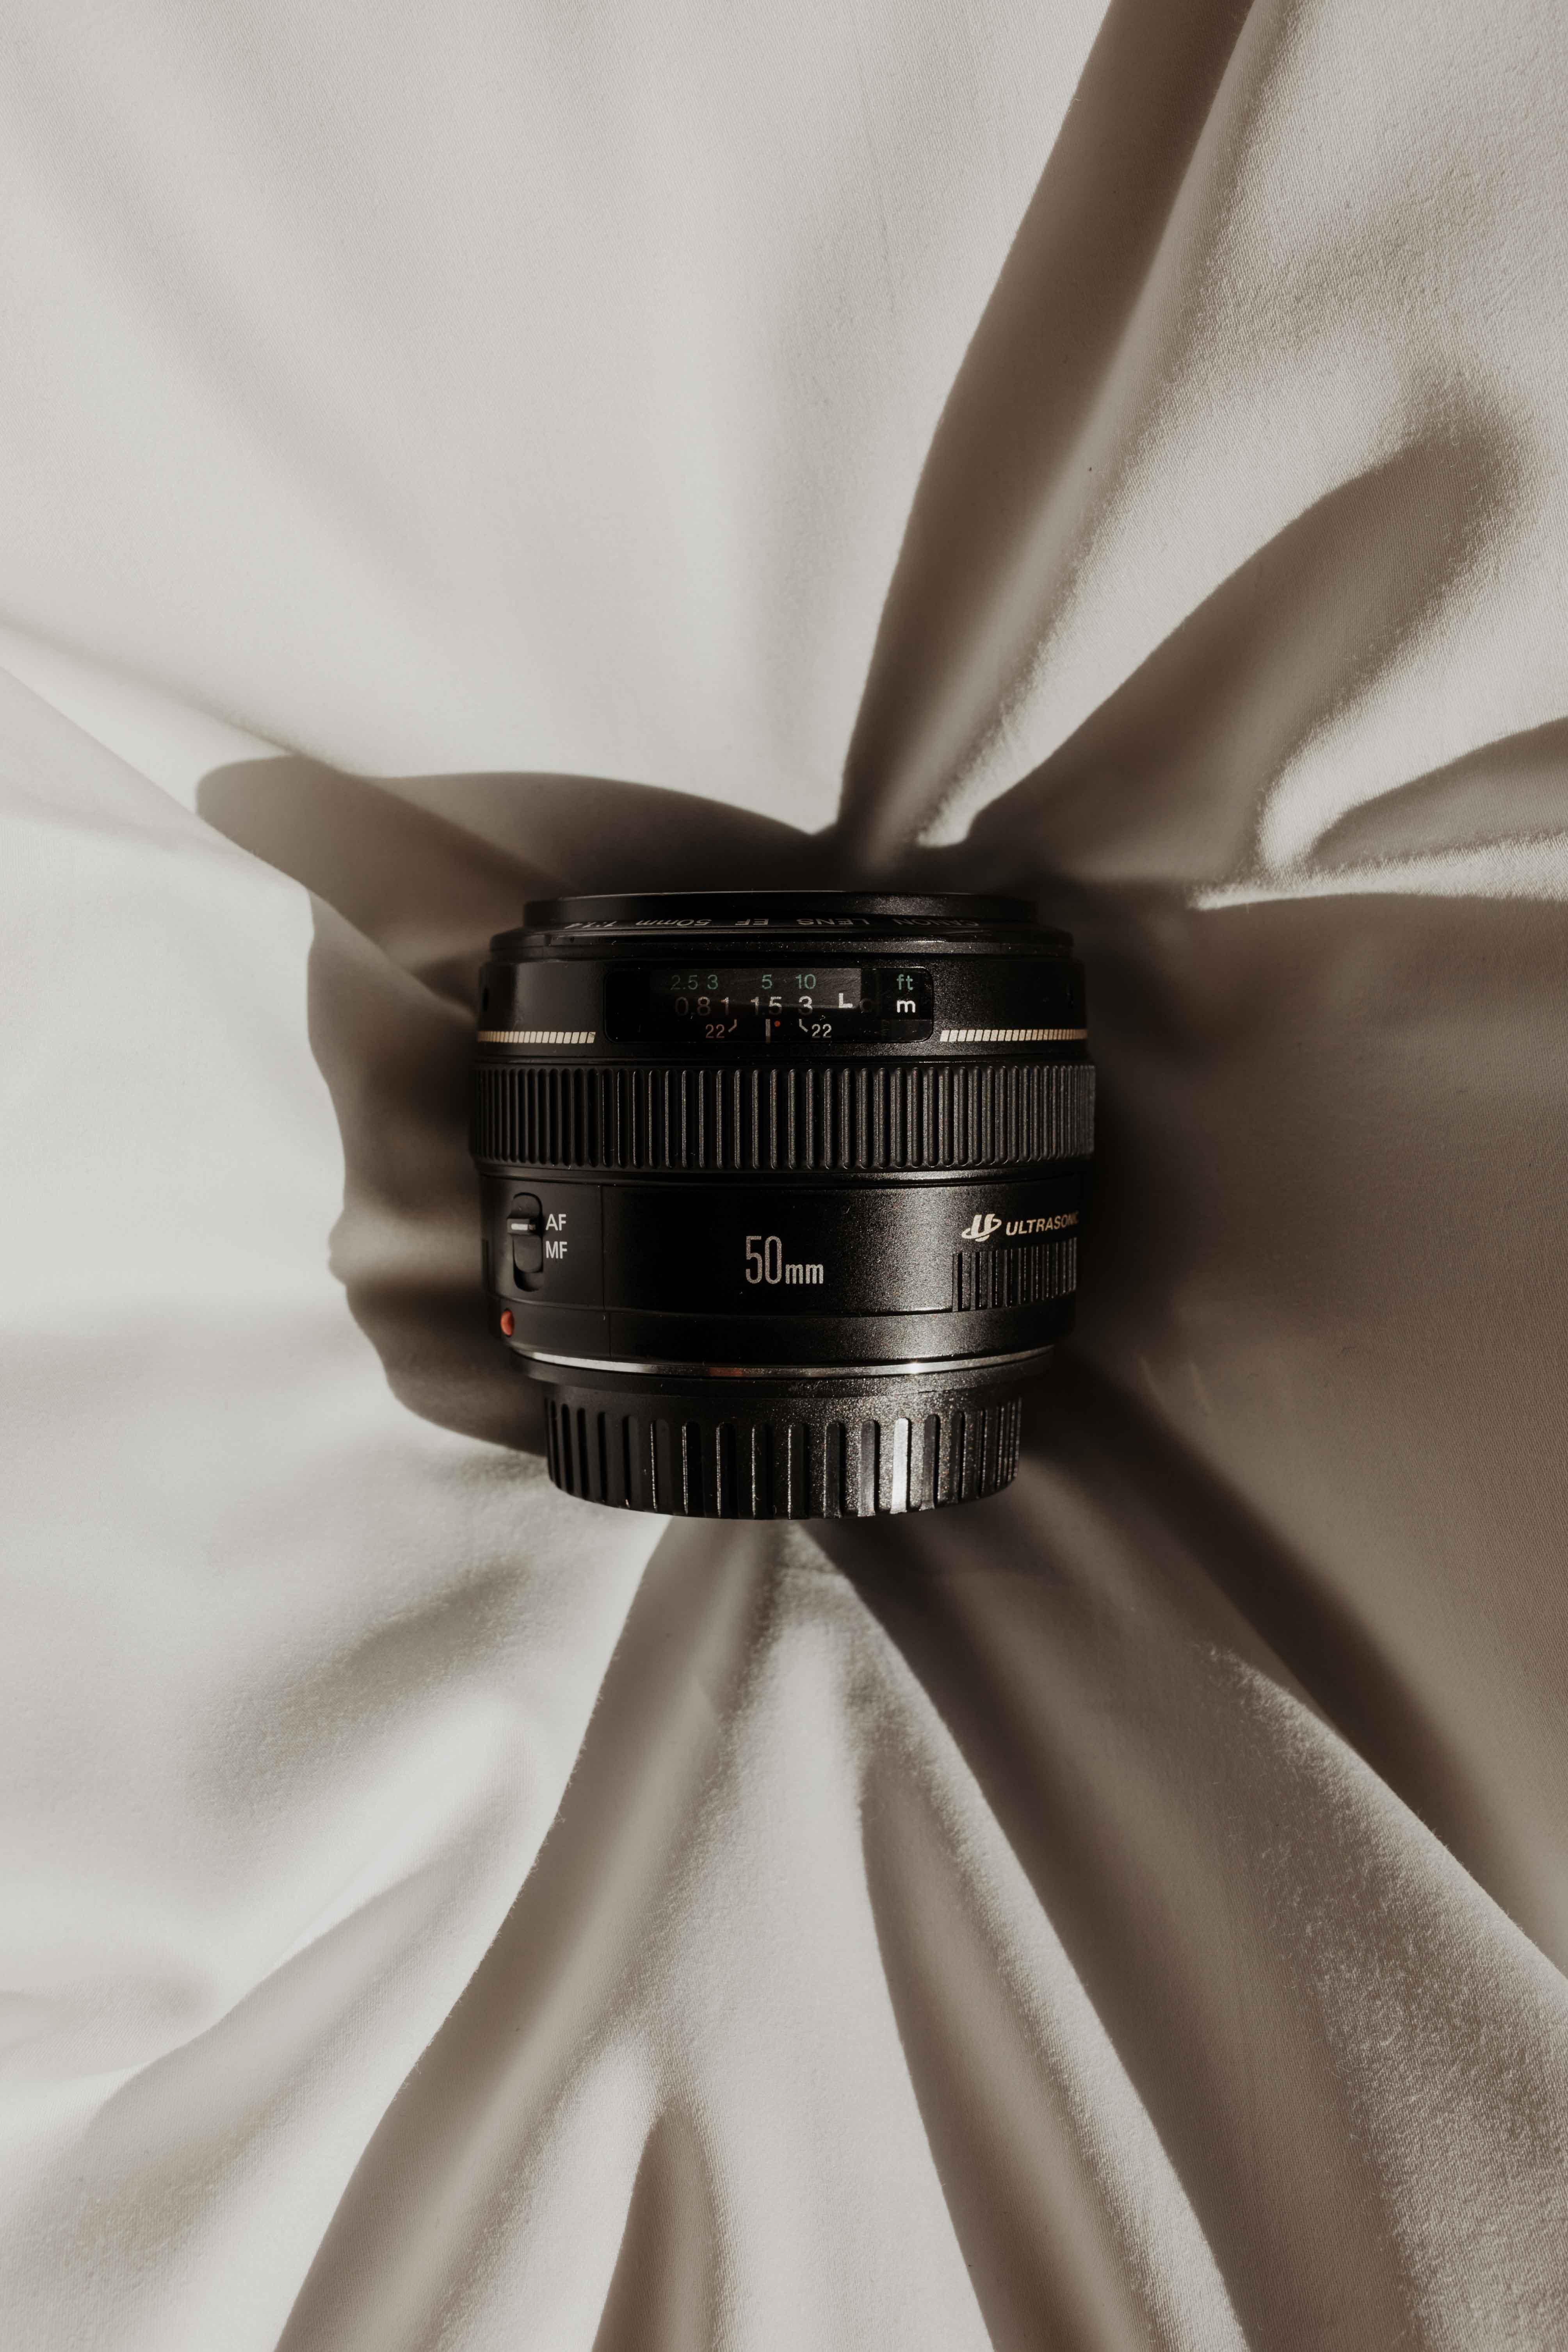 annalaurakummer, kamera, canon, kameras, objektiv, objektive, fotografie, blogger, ausstattung